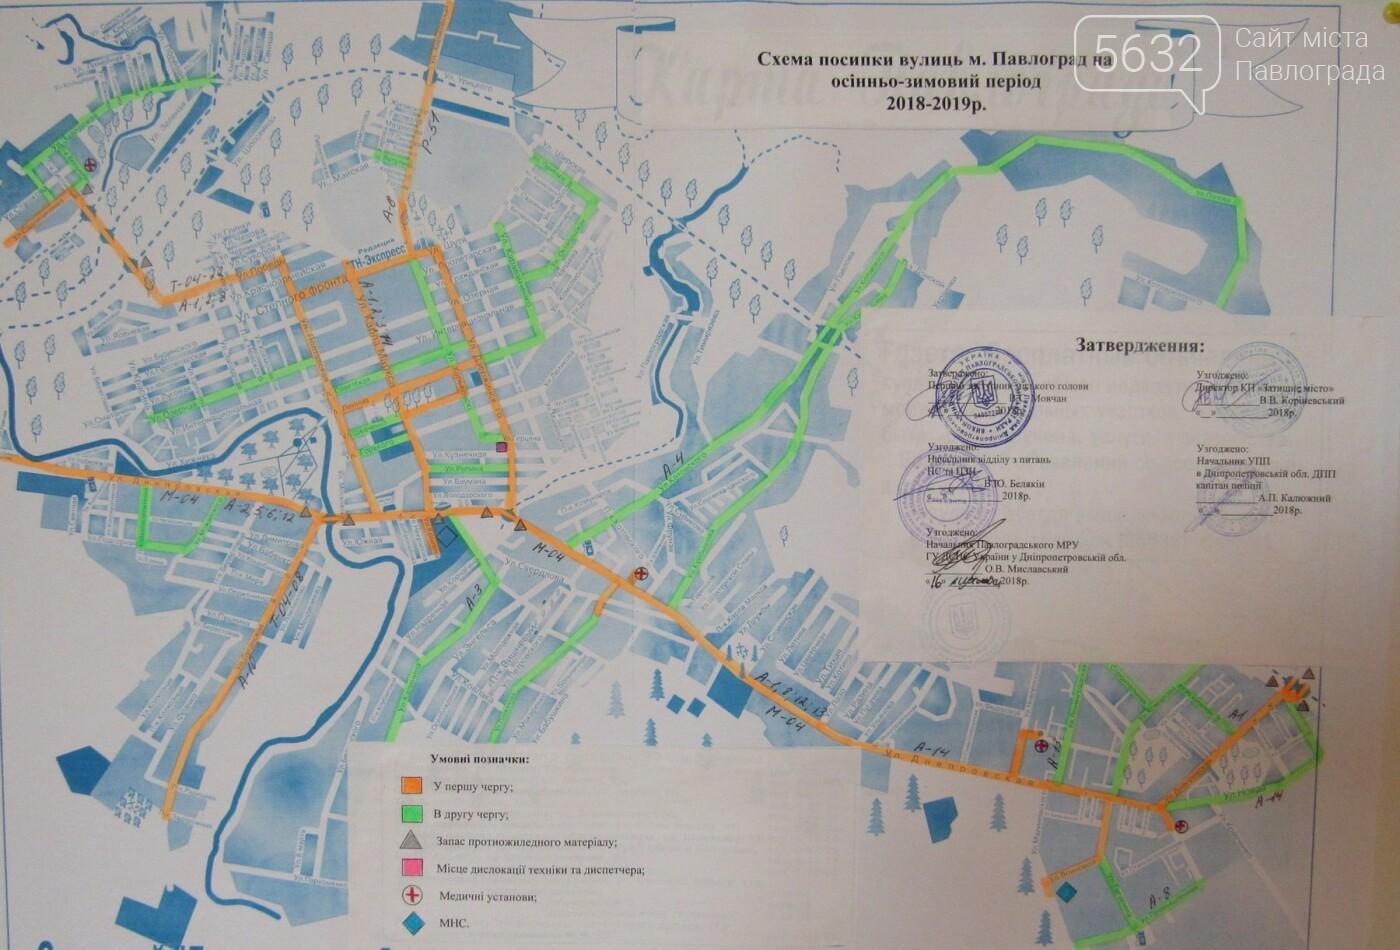 В Павлограде составили карту-схему посыпки дорог в осенне-зимний период , фото-1